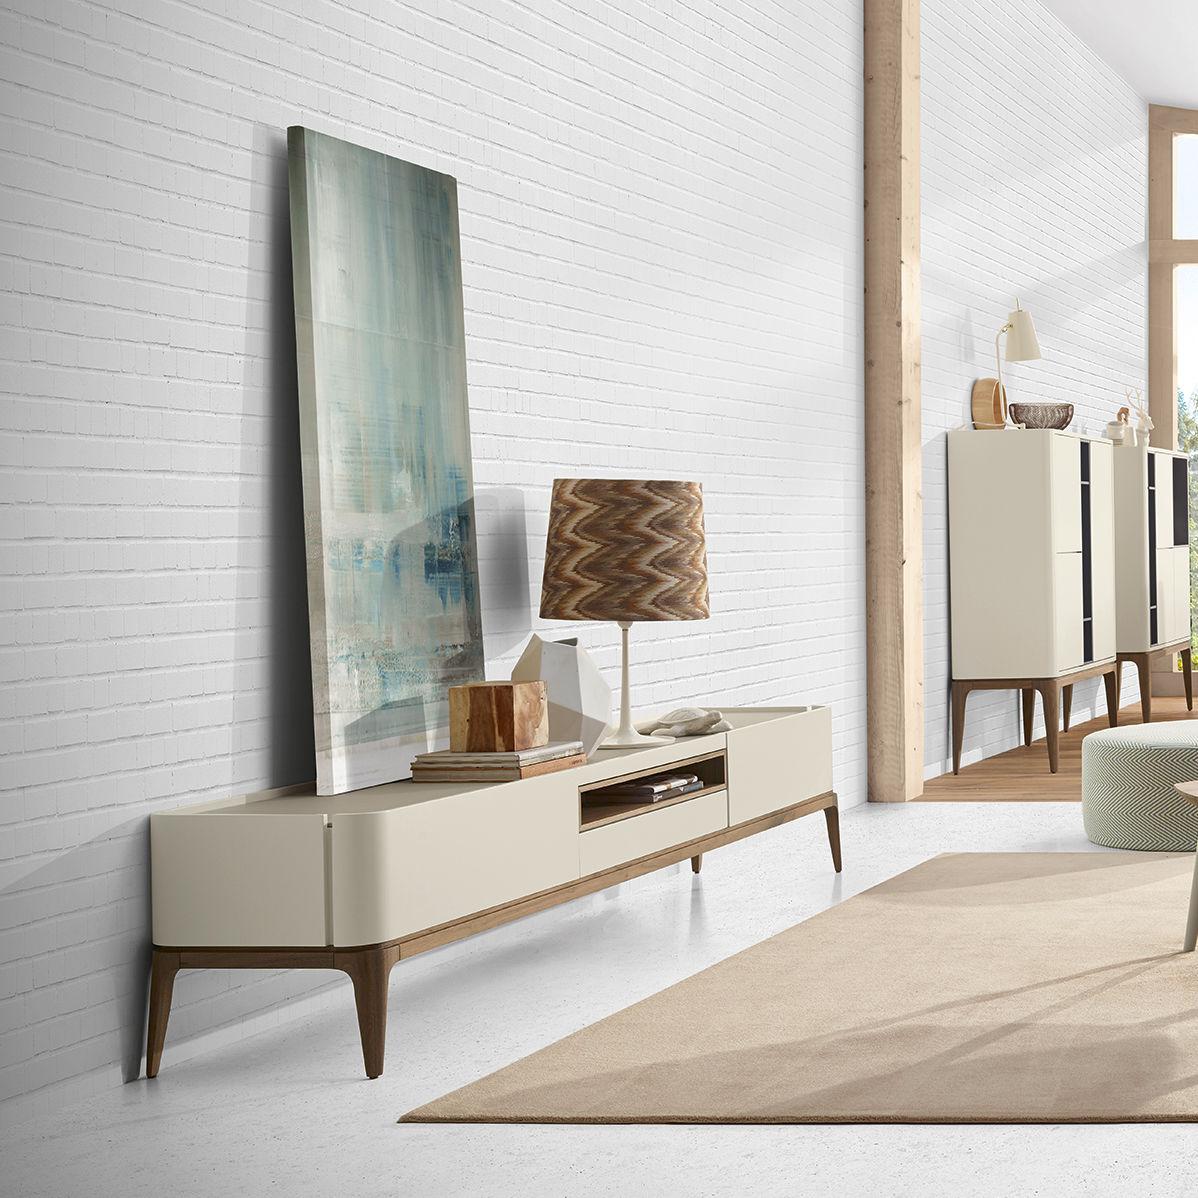 Tv pour chambre meuble tele chambre meuble tv chambre Meuble tele pour chambre